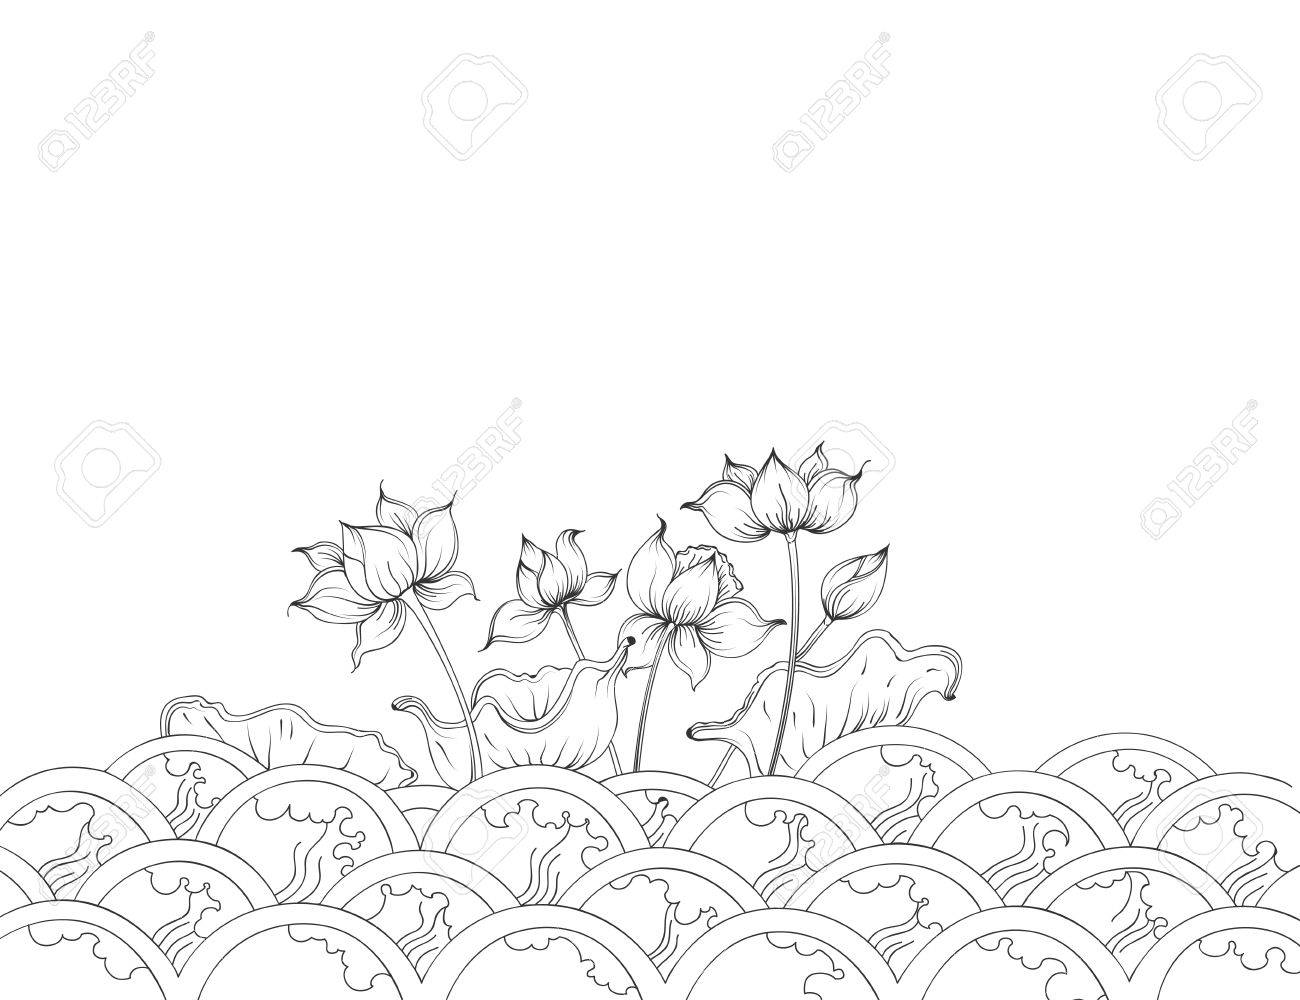 Lotus flowers art patternthai culture vector on a white background lotus flowers art patternthai culture vector on a white background stock vector 79577701 izmirmasajfo